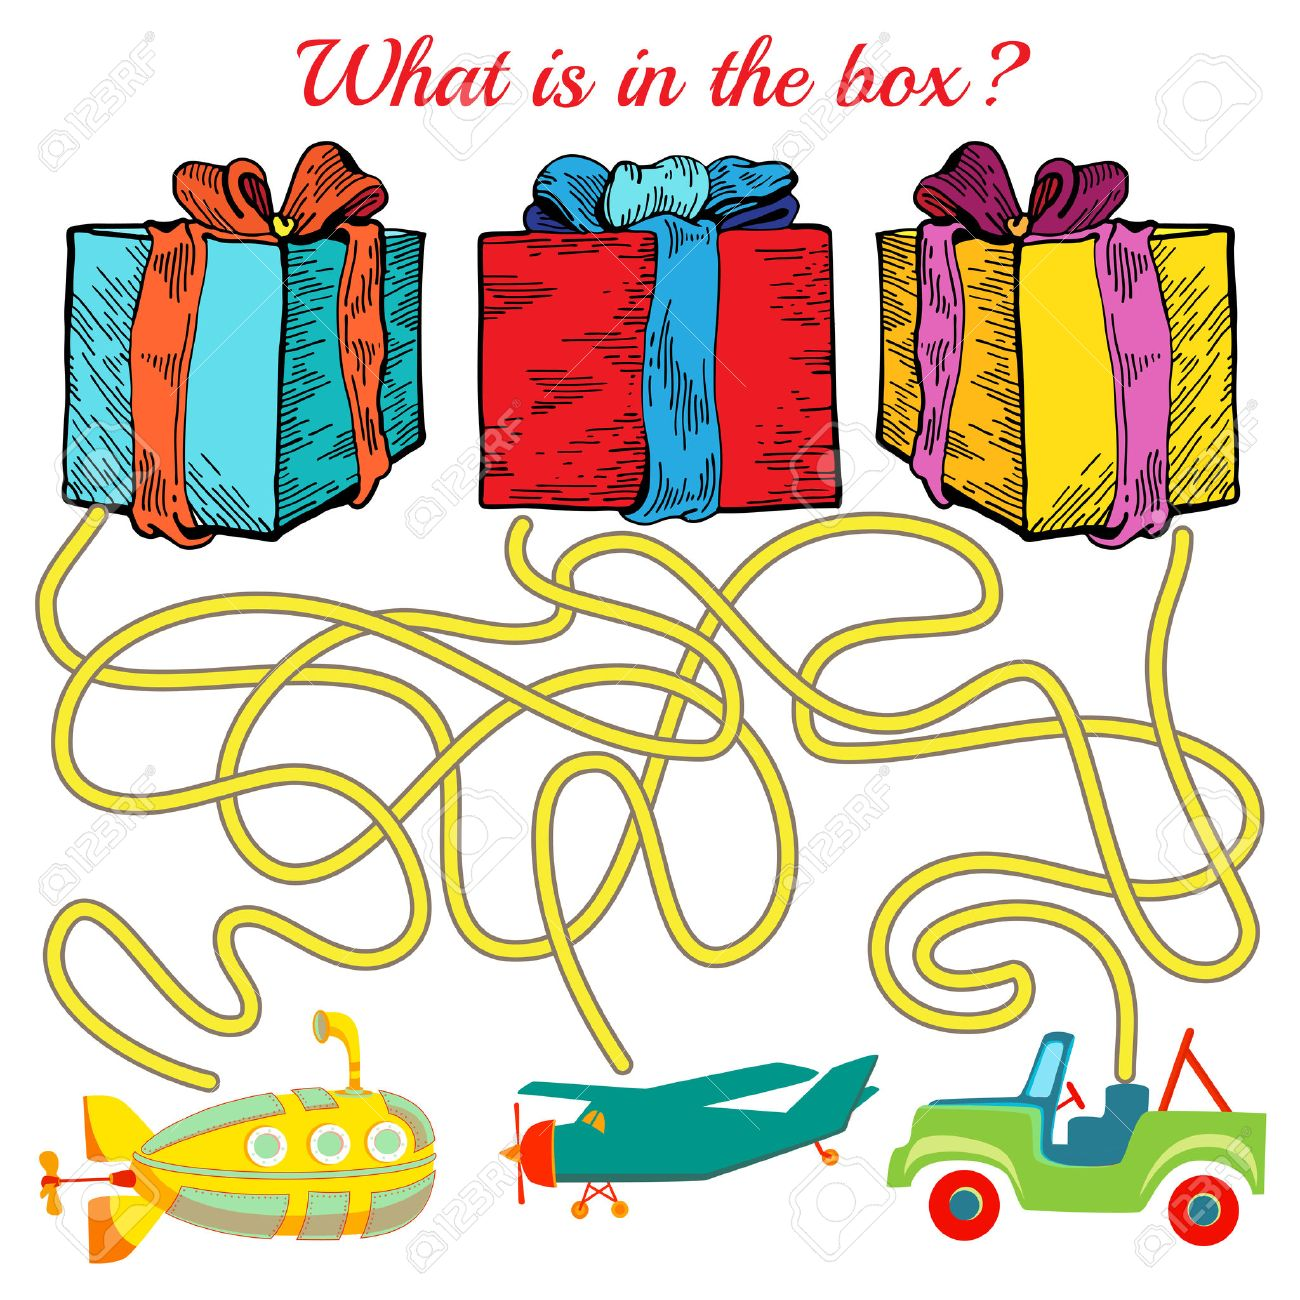 Funny Maze Game For Kids Visualor Game For Preschool Children